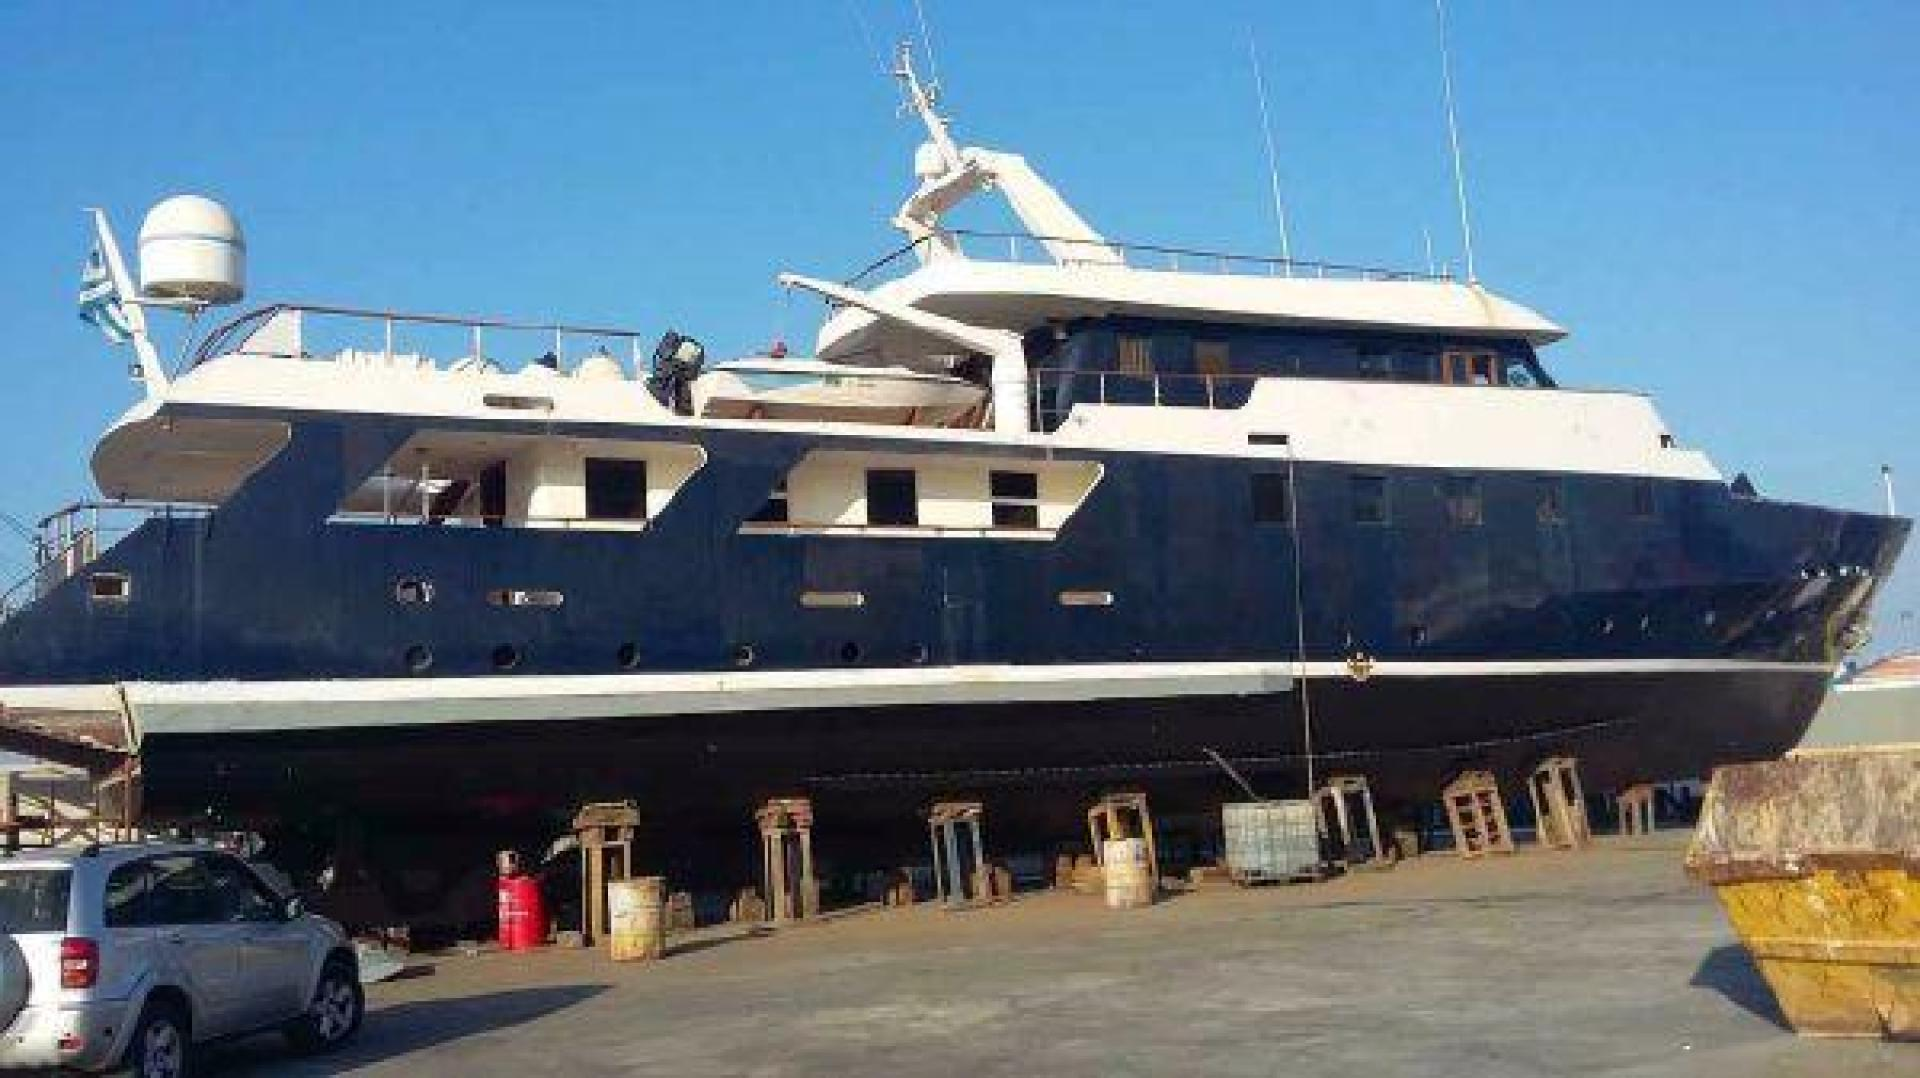 Custom-Anastasiades & Tso 1982-Star Alliance Salvador De Bahia-Brazil-1566434 | Thumbnail